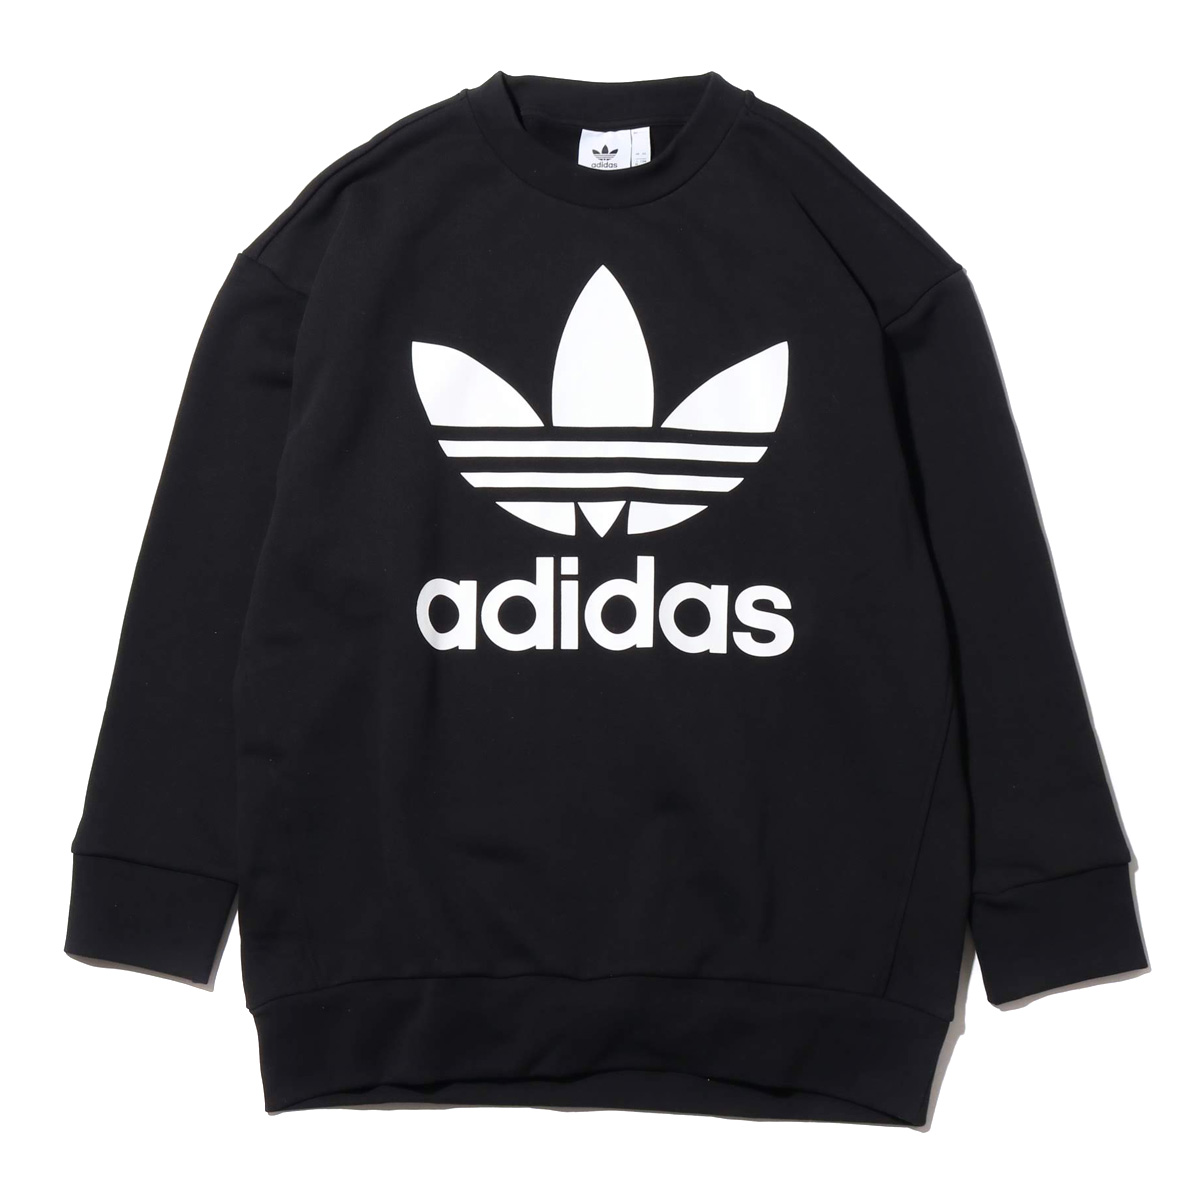 adidas Originals TREFOIL OVERSIZED CREW (アディダス オリジナルス トレフォイル オーバーサイズクルー) Black【メンズ パーカー】18FW-I